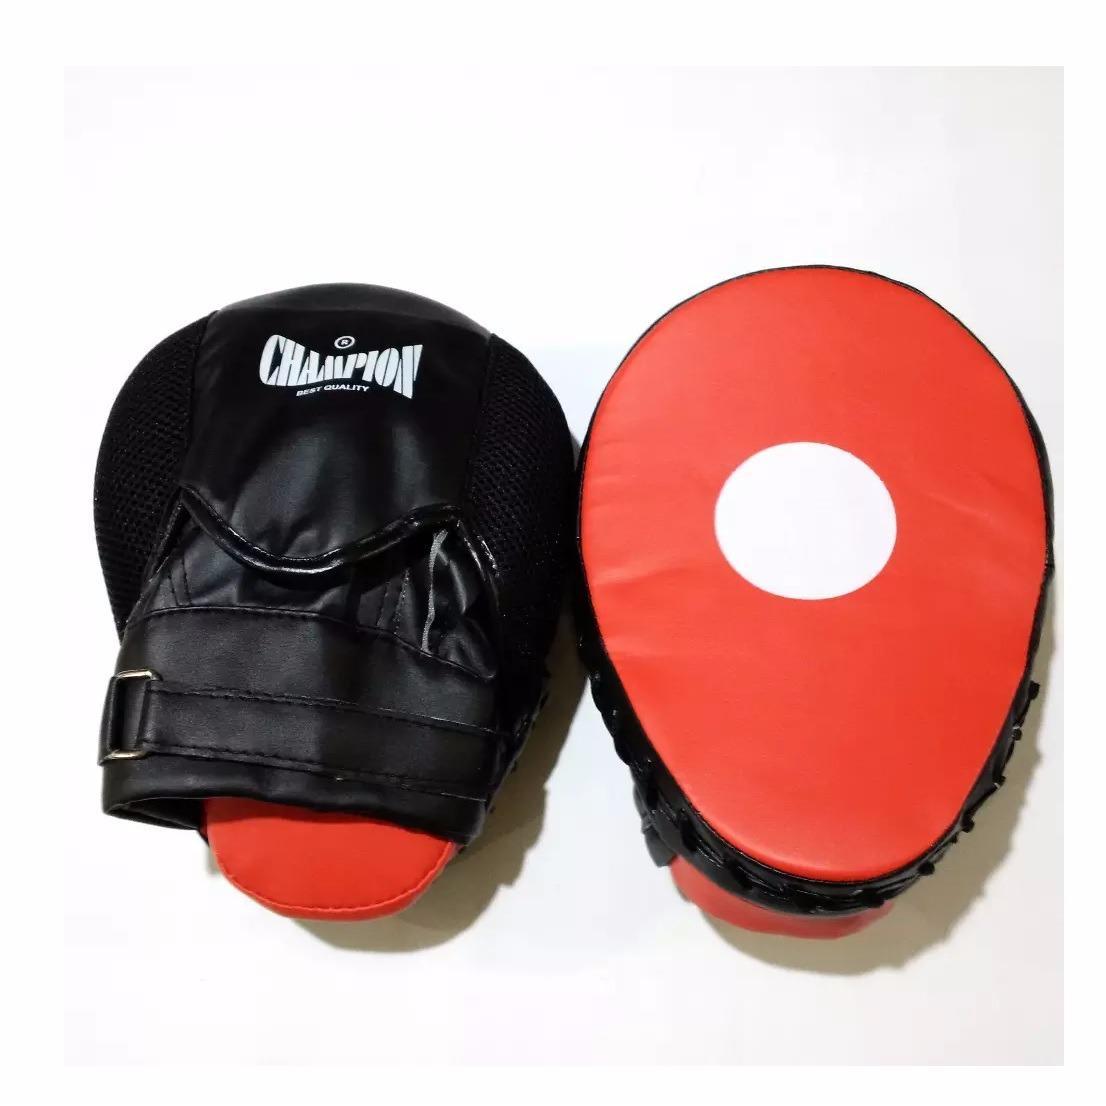 Champion Focus Mitt / Target Pukul / Kick / Punching Pad For Boxing Mma Muaythai Glove